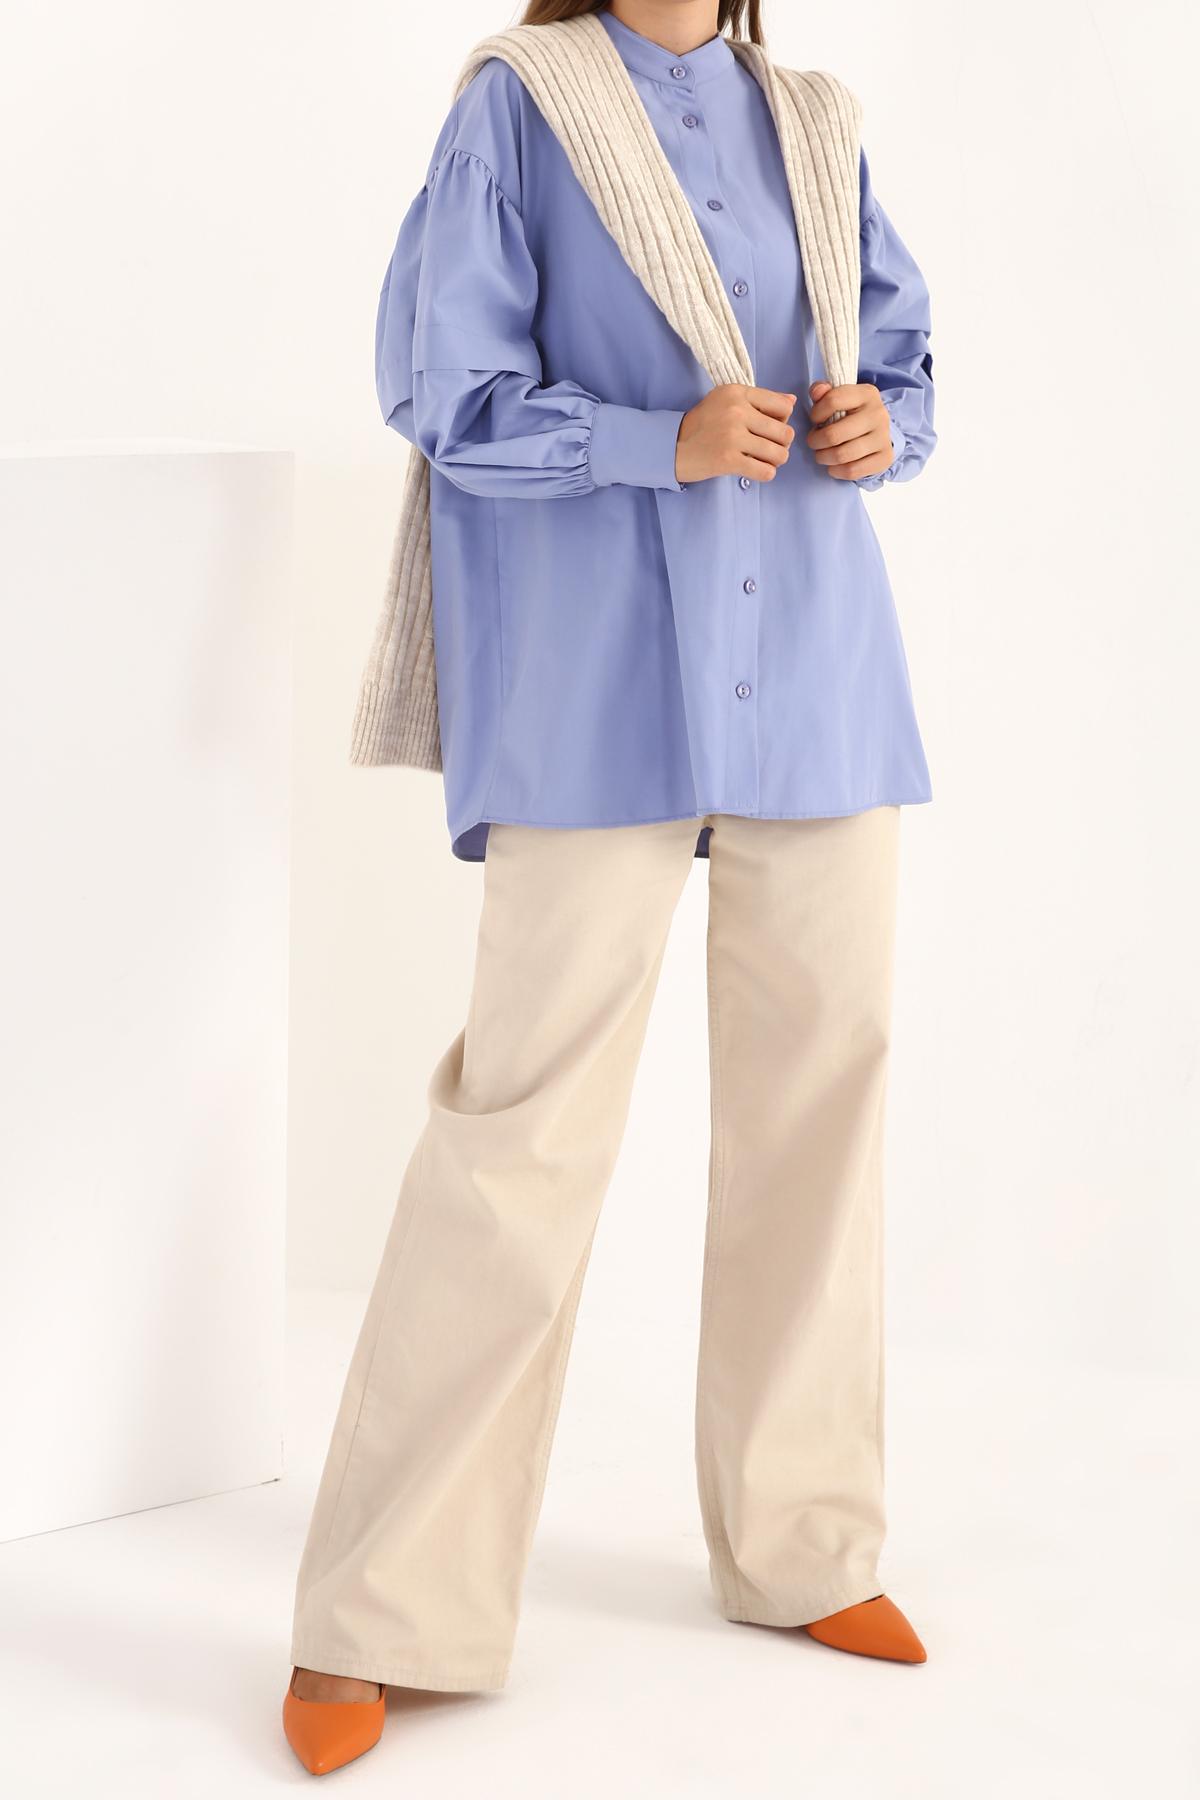 Shir Detailed Sleeve Shirt Tunic